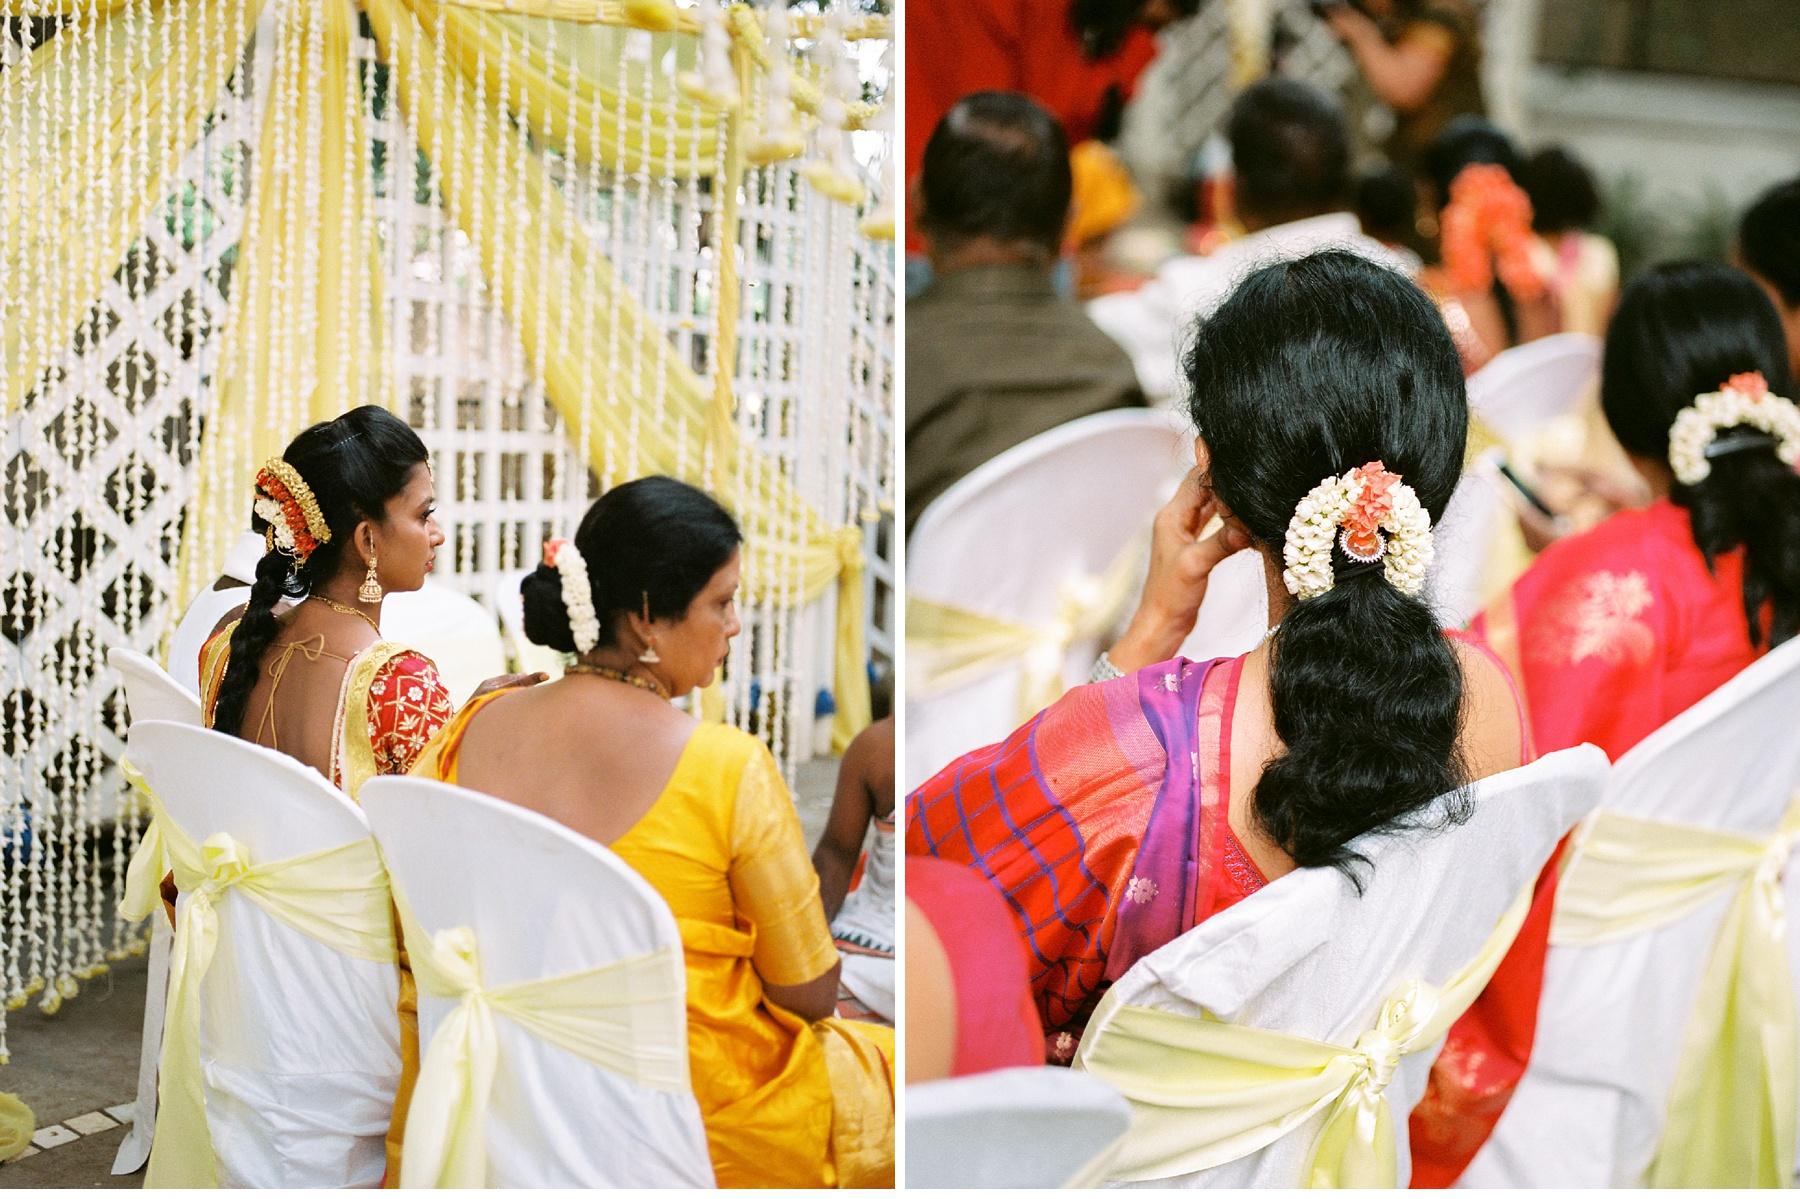 Southern_India_Wedding_Ceremony_0006.jpg